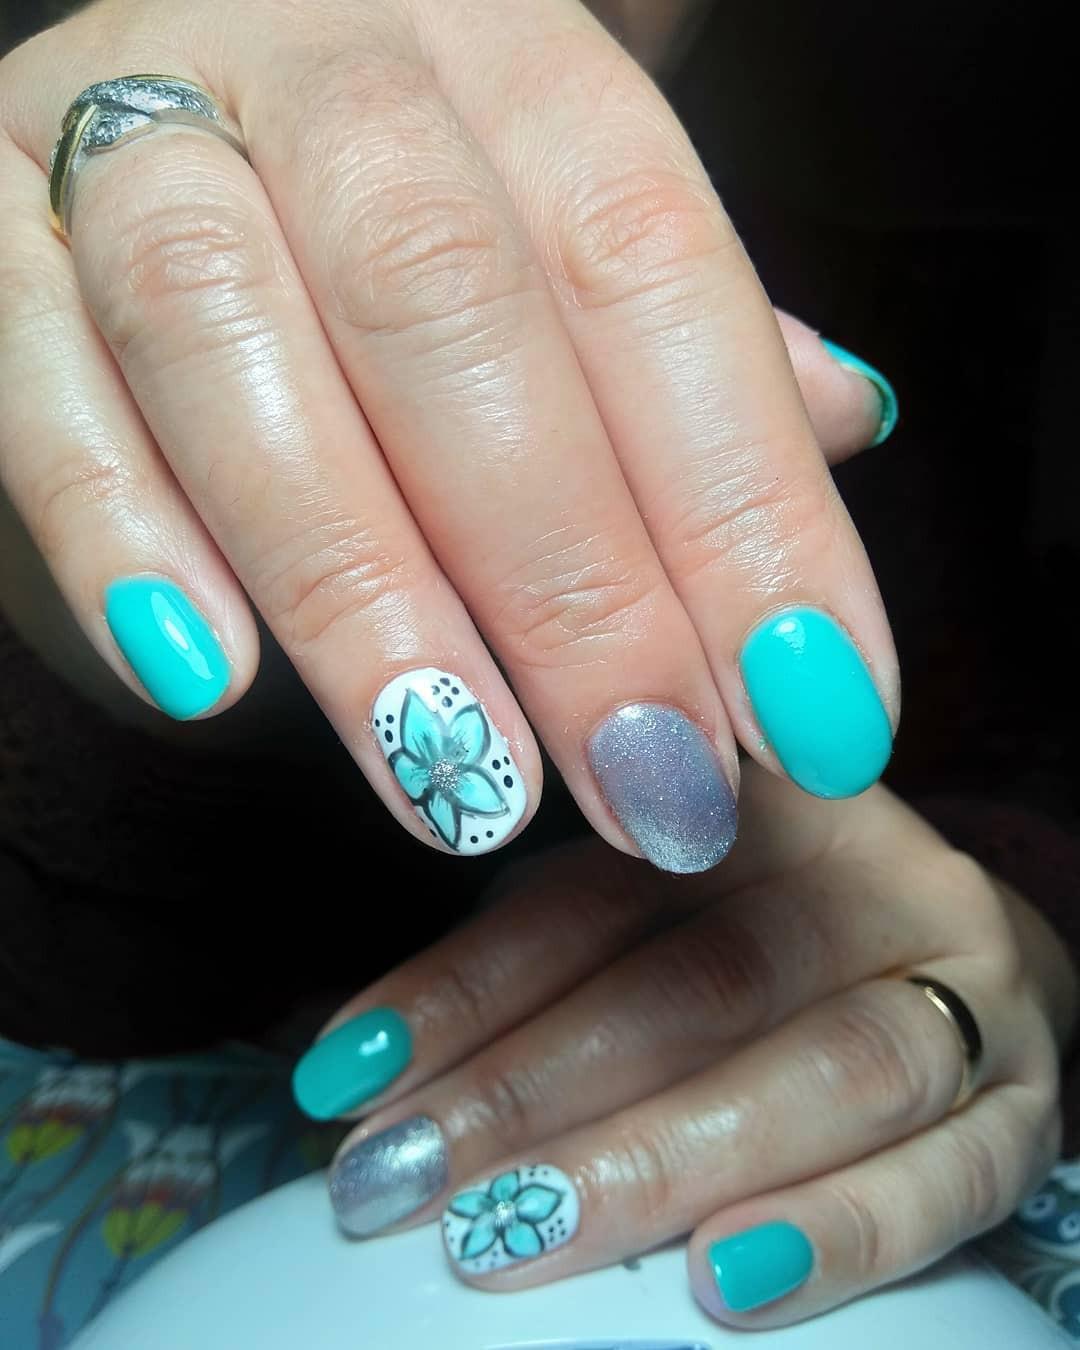 50 Cute Summer Nail Designs for 2020,summer gel nails 2020,nail designs 2020,nail trends 2020